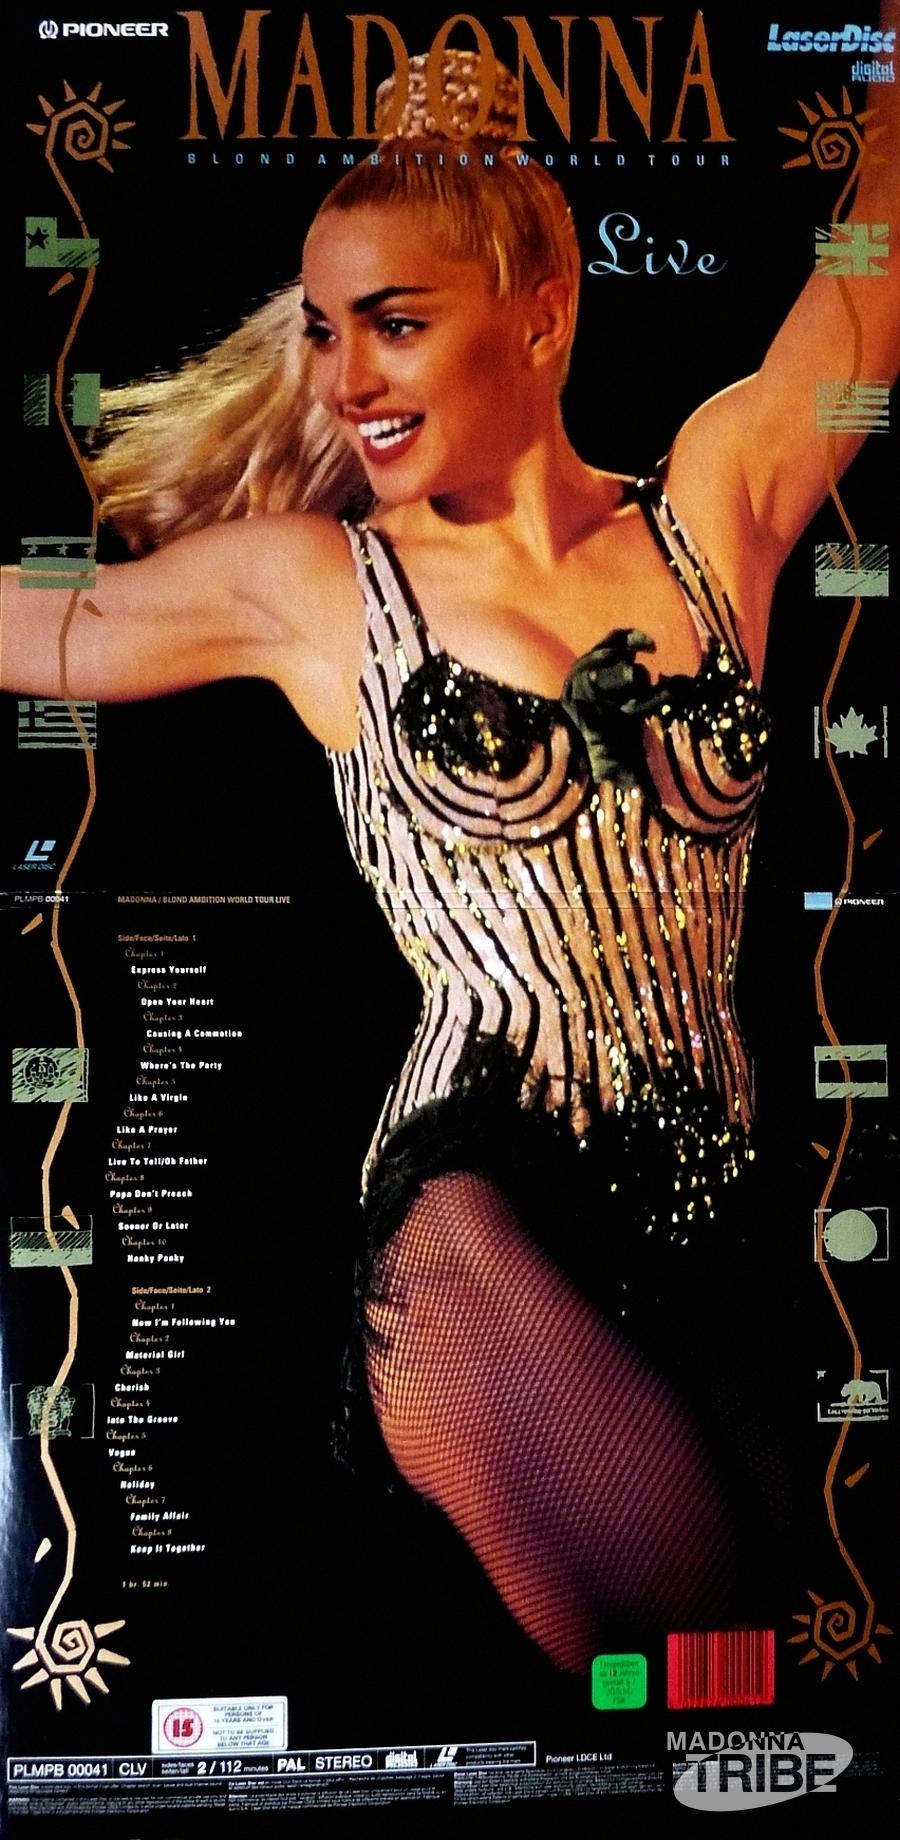 Gira 'Blond Ambition Tour' 1990 Blond_laserdisc_001